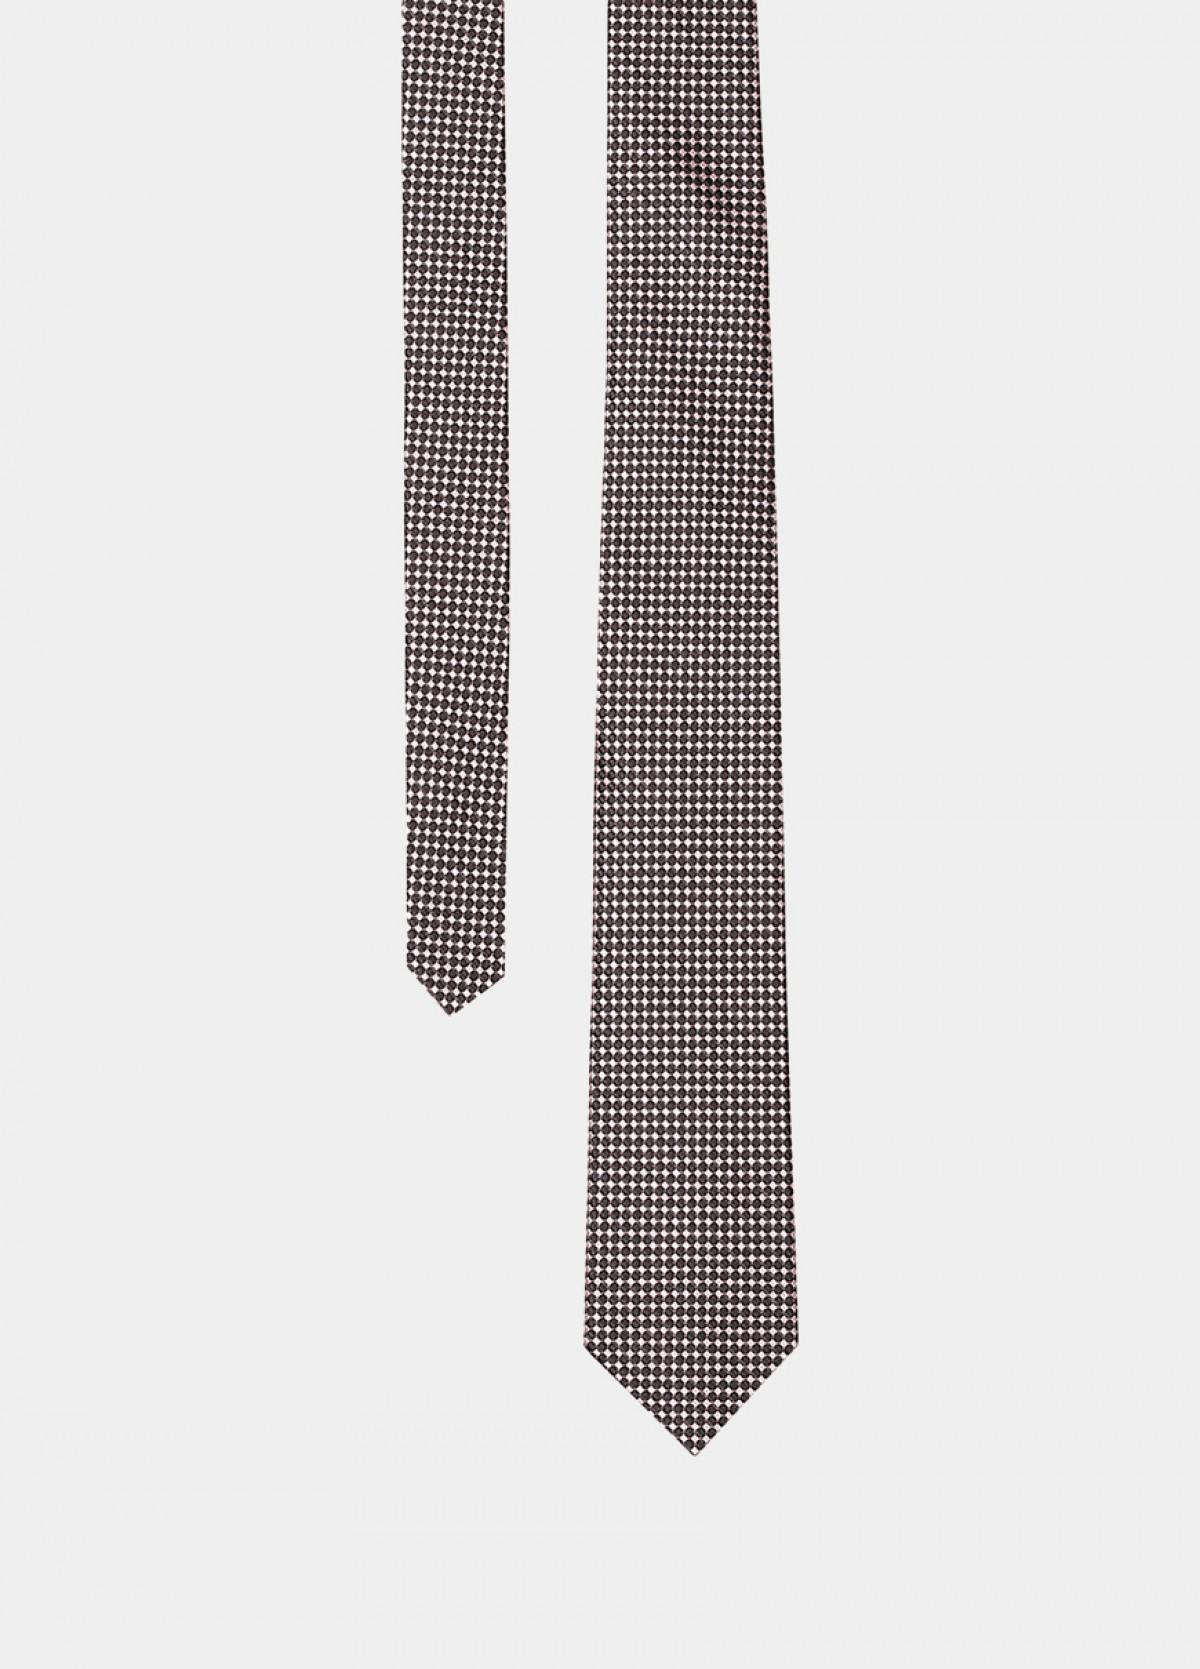 The Black Silk Tie